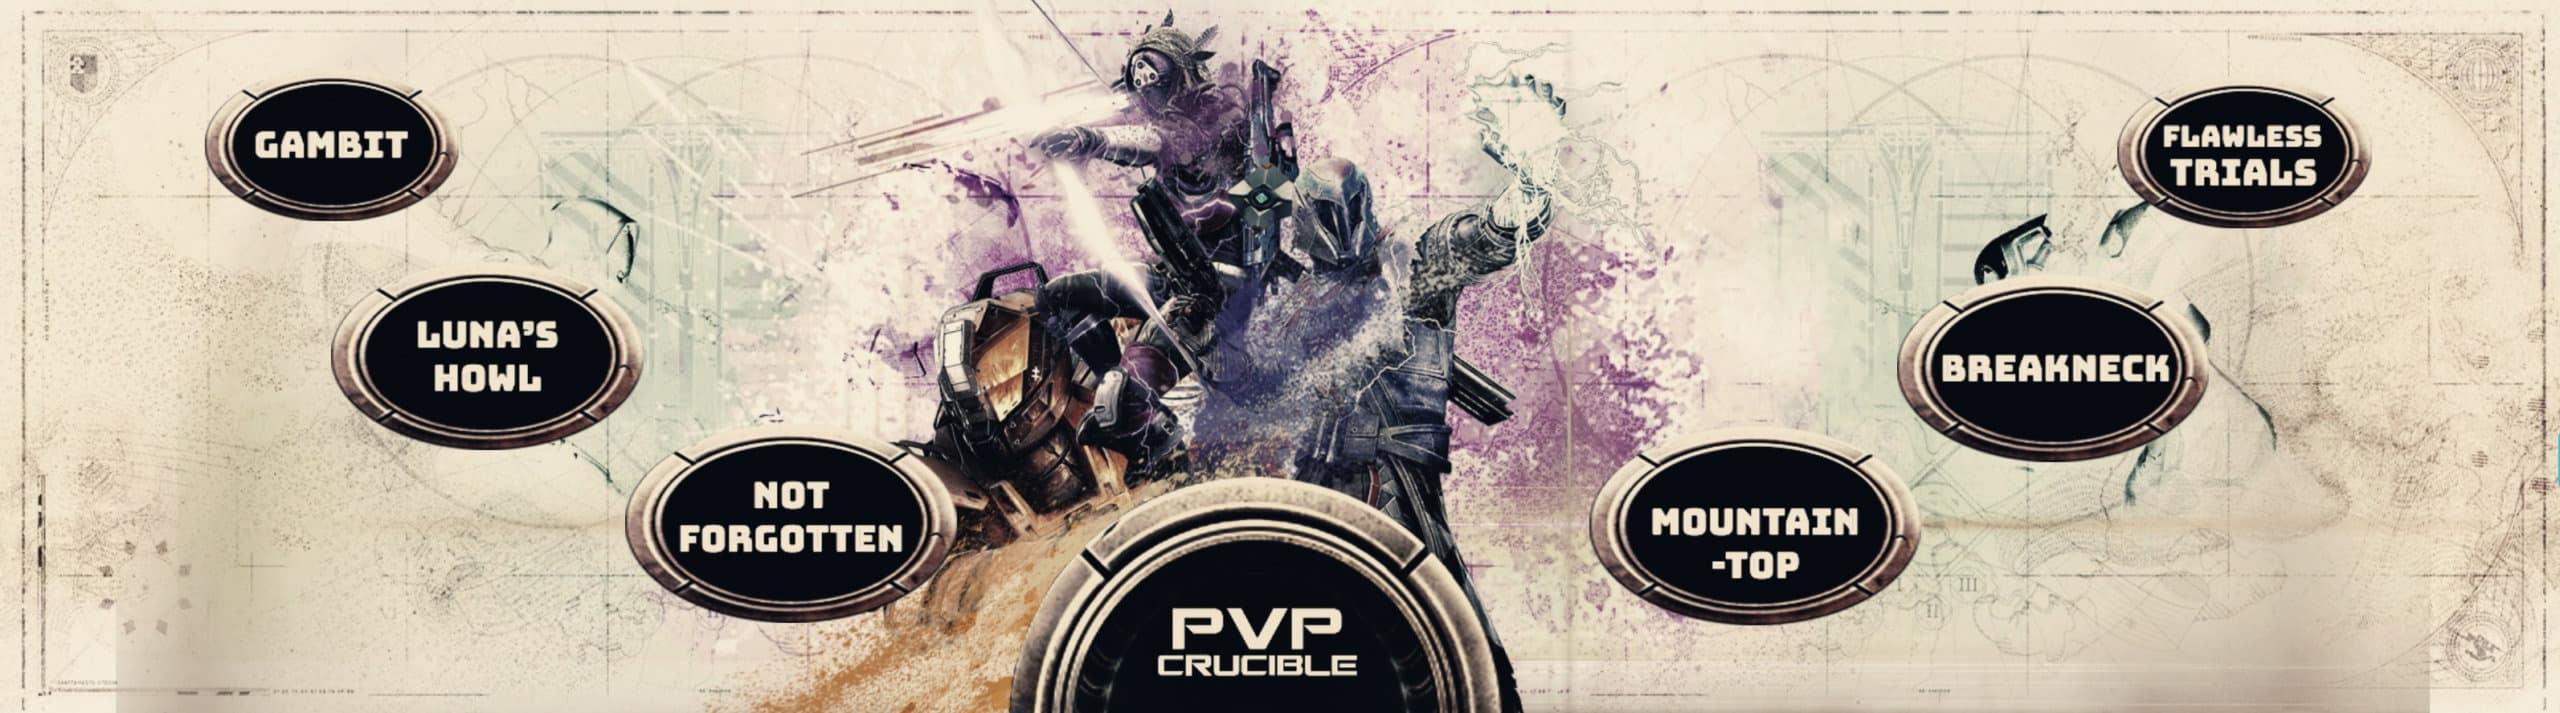 Destiny 2 PVP Crucible